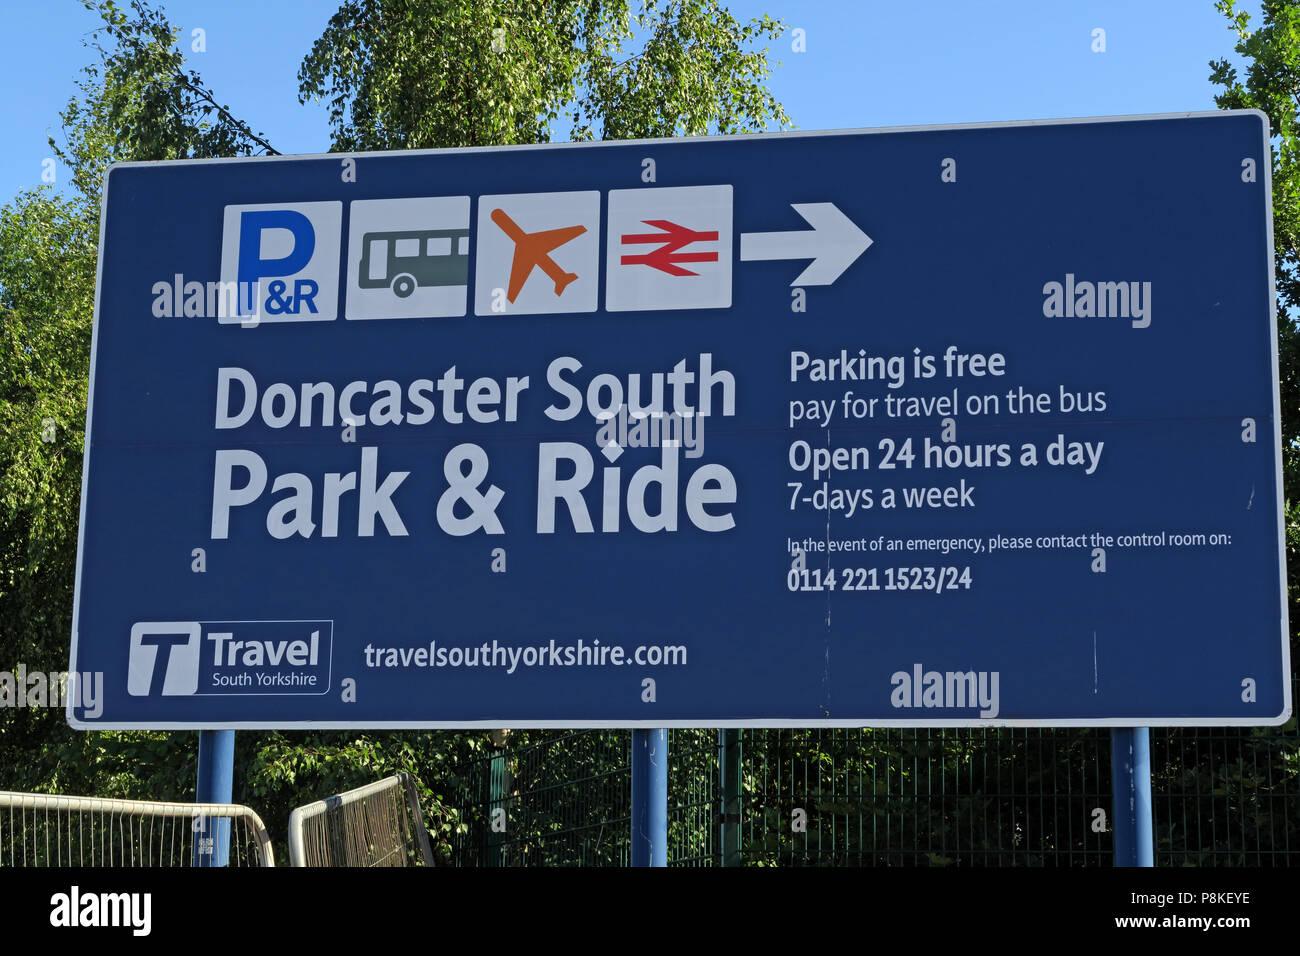 Laden Sie dieses Alamy Stockfoto Doncaster South kostenlose Park-and-Ride, Schafe Brücke Ln, Rossington, Doncaster DN 11 0 GT - P8KEYE